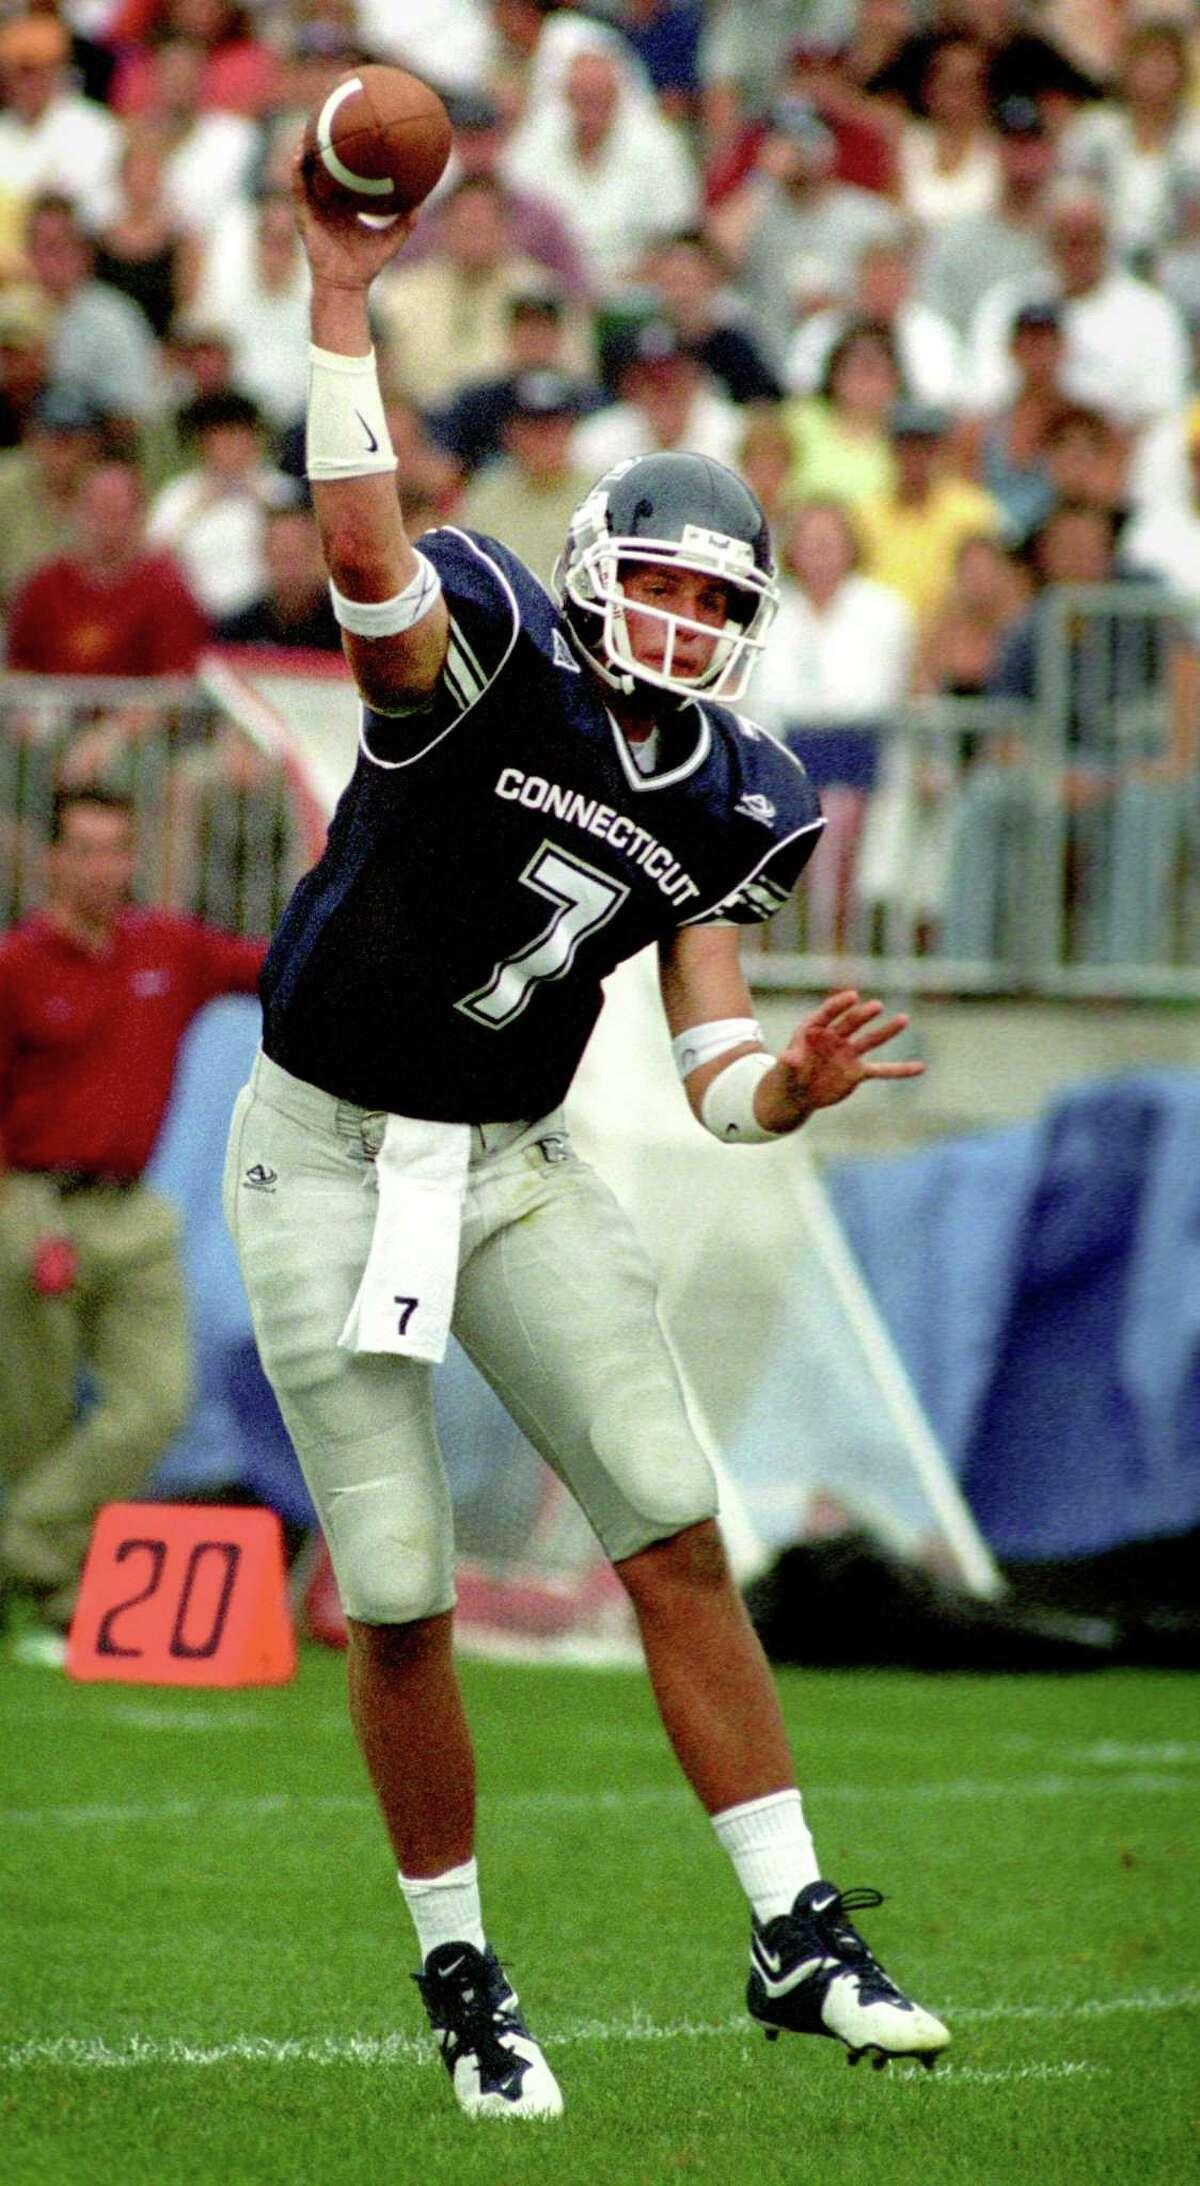 Dan Orlovsky throws a pass against Indiana on Aug. 30, 2003.